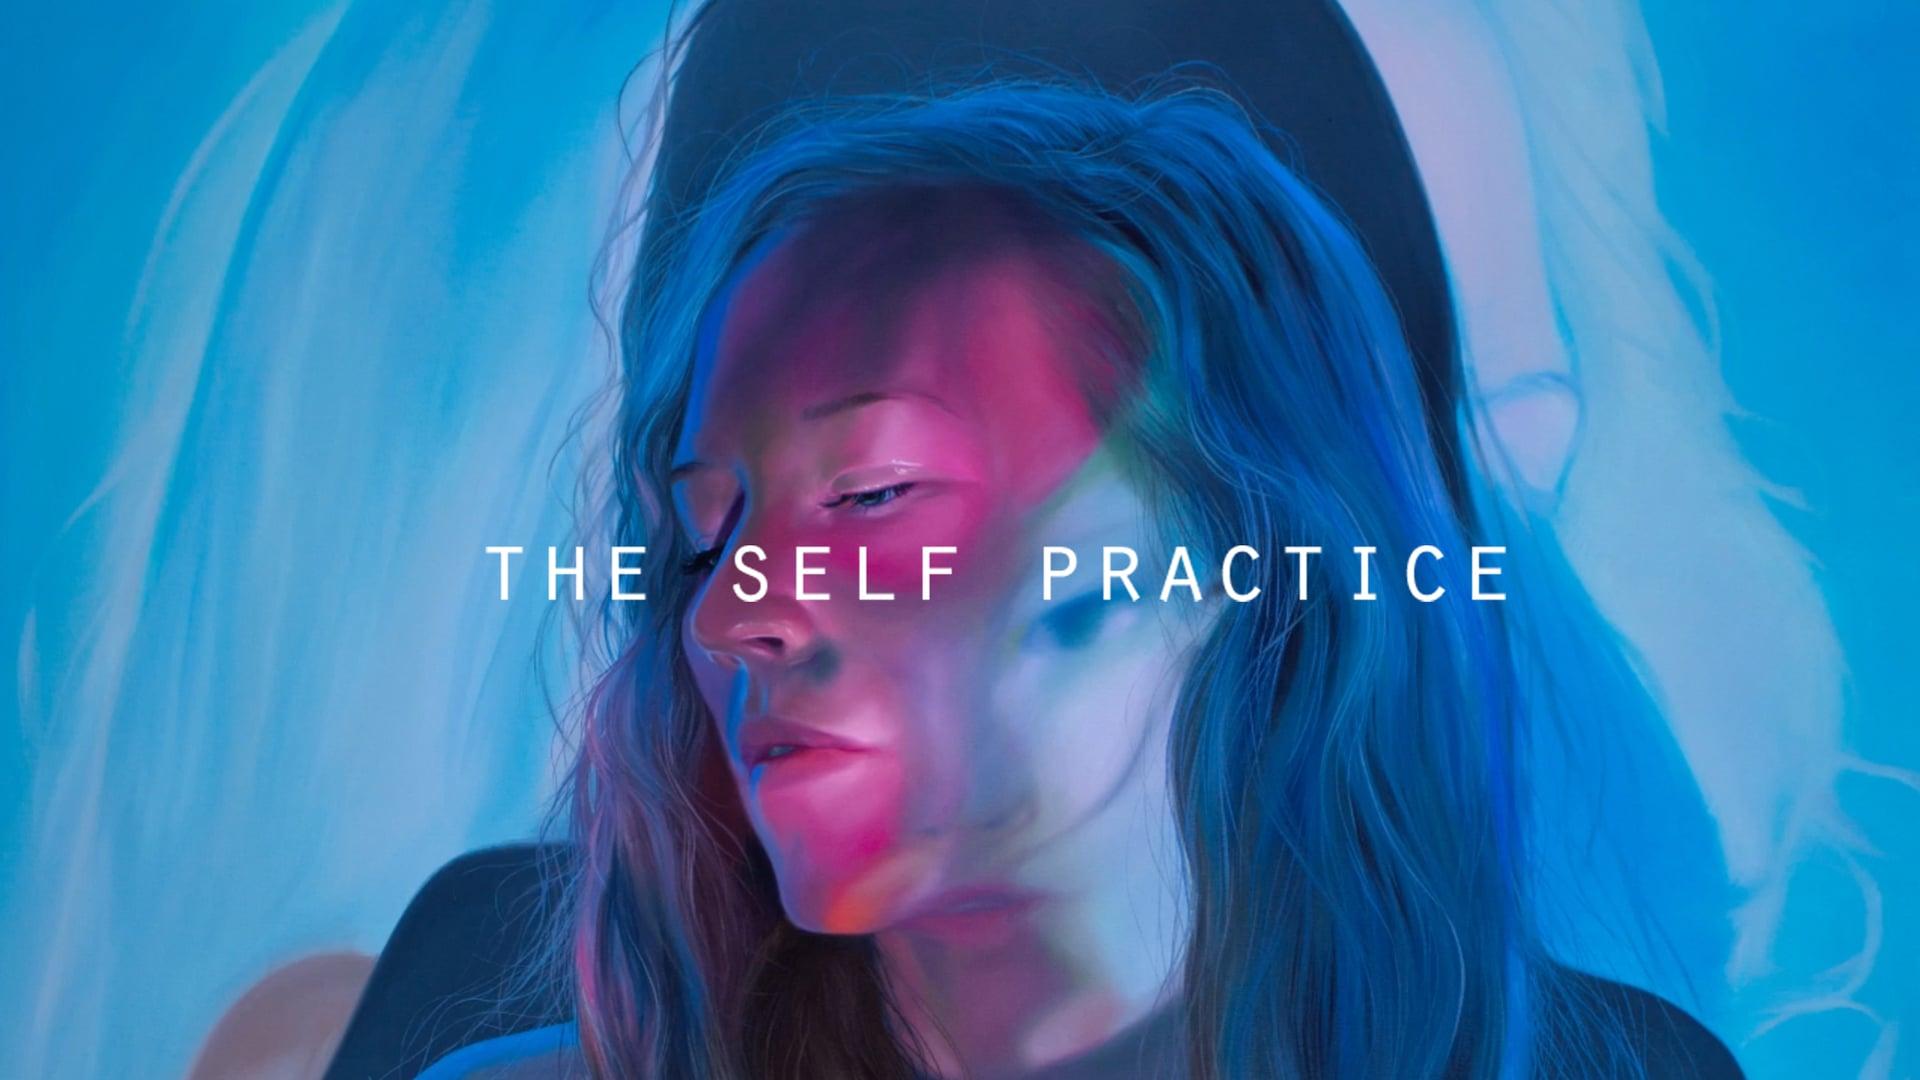 The Self Practice